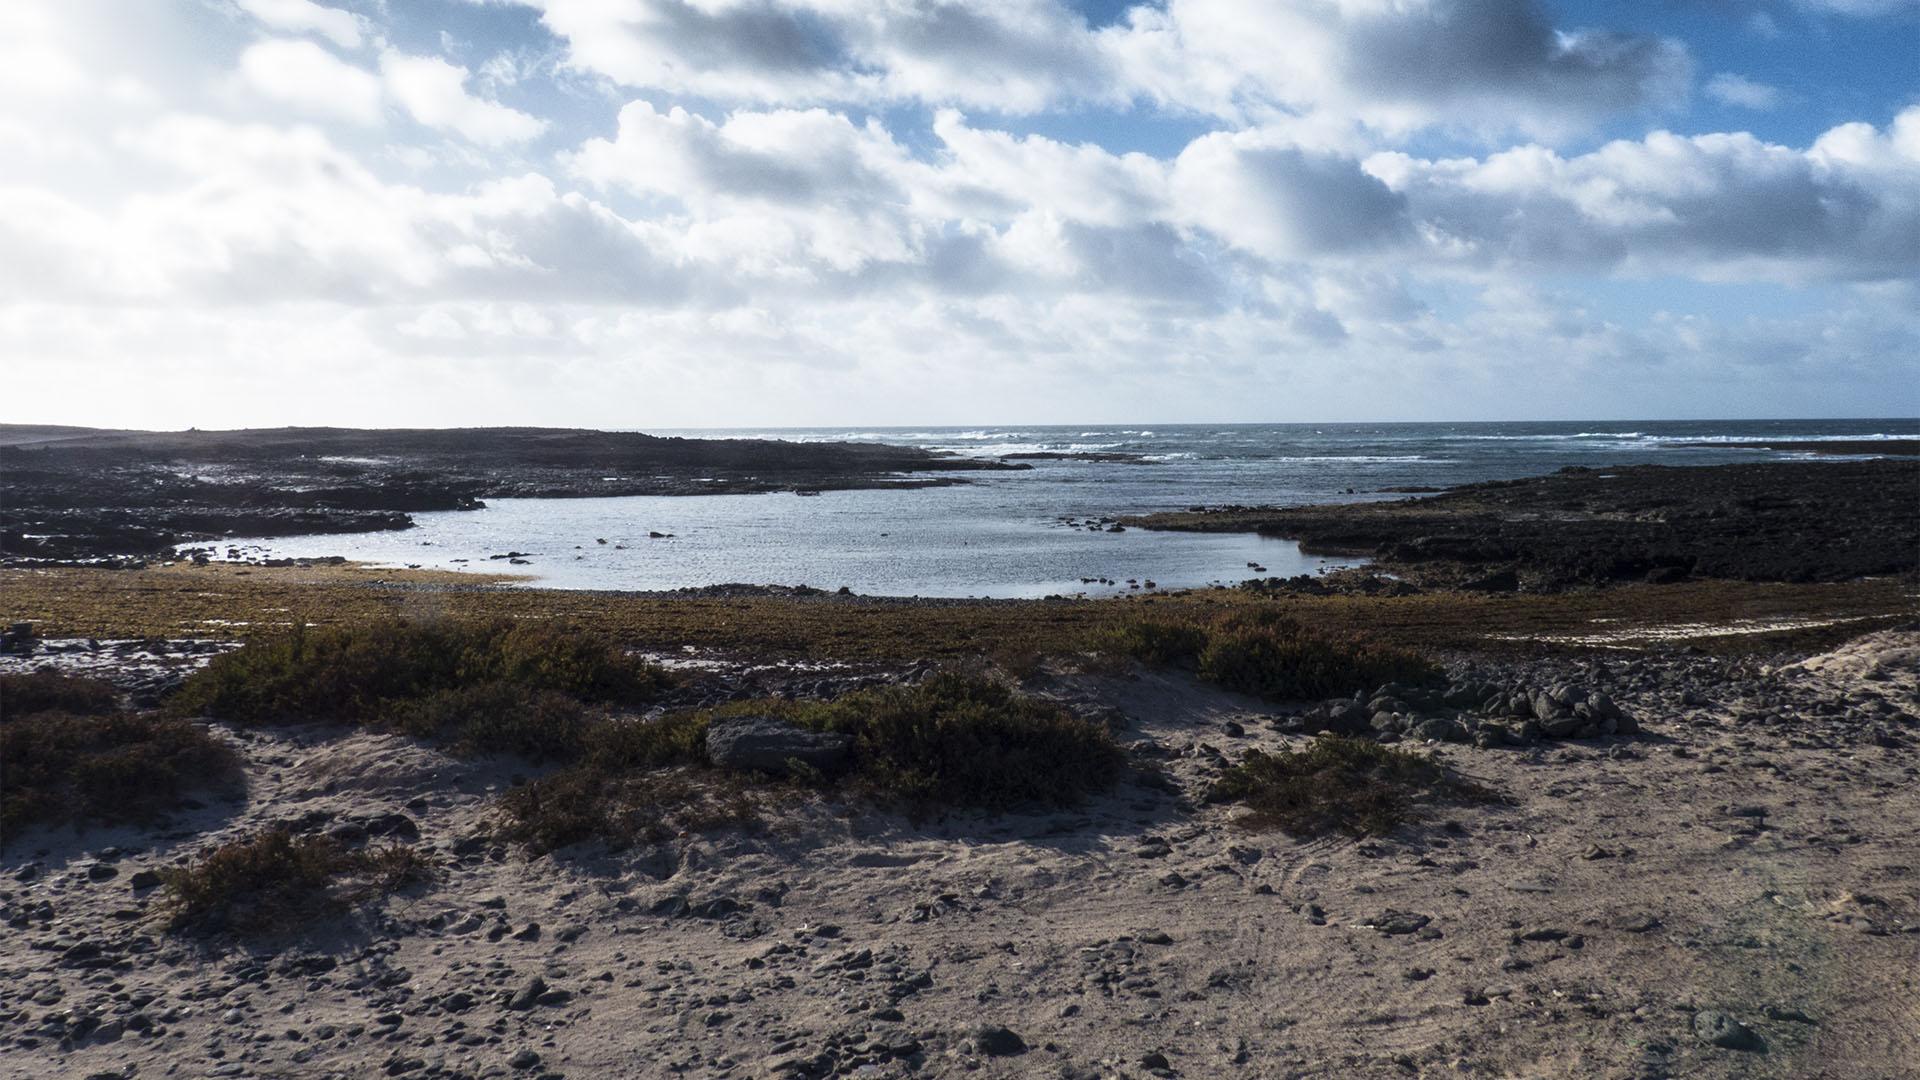 Die Strände Fuerteventuras: Playa Blanca North Shore.